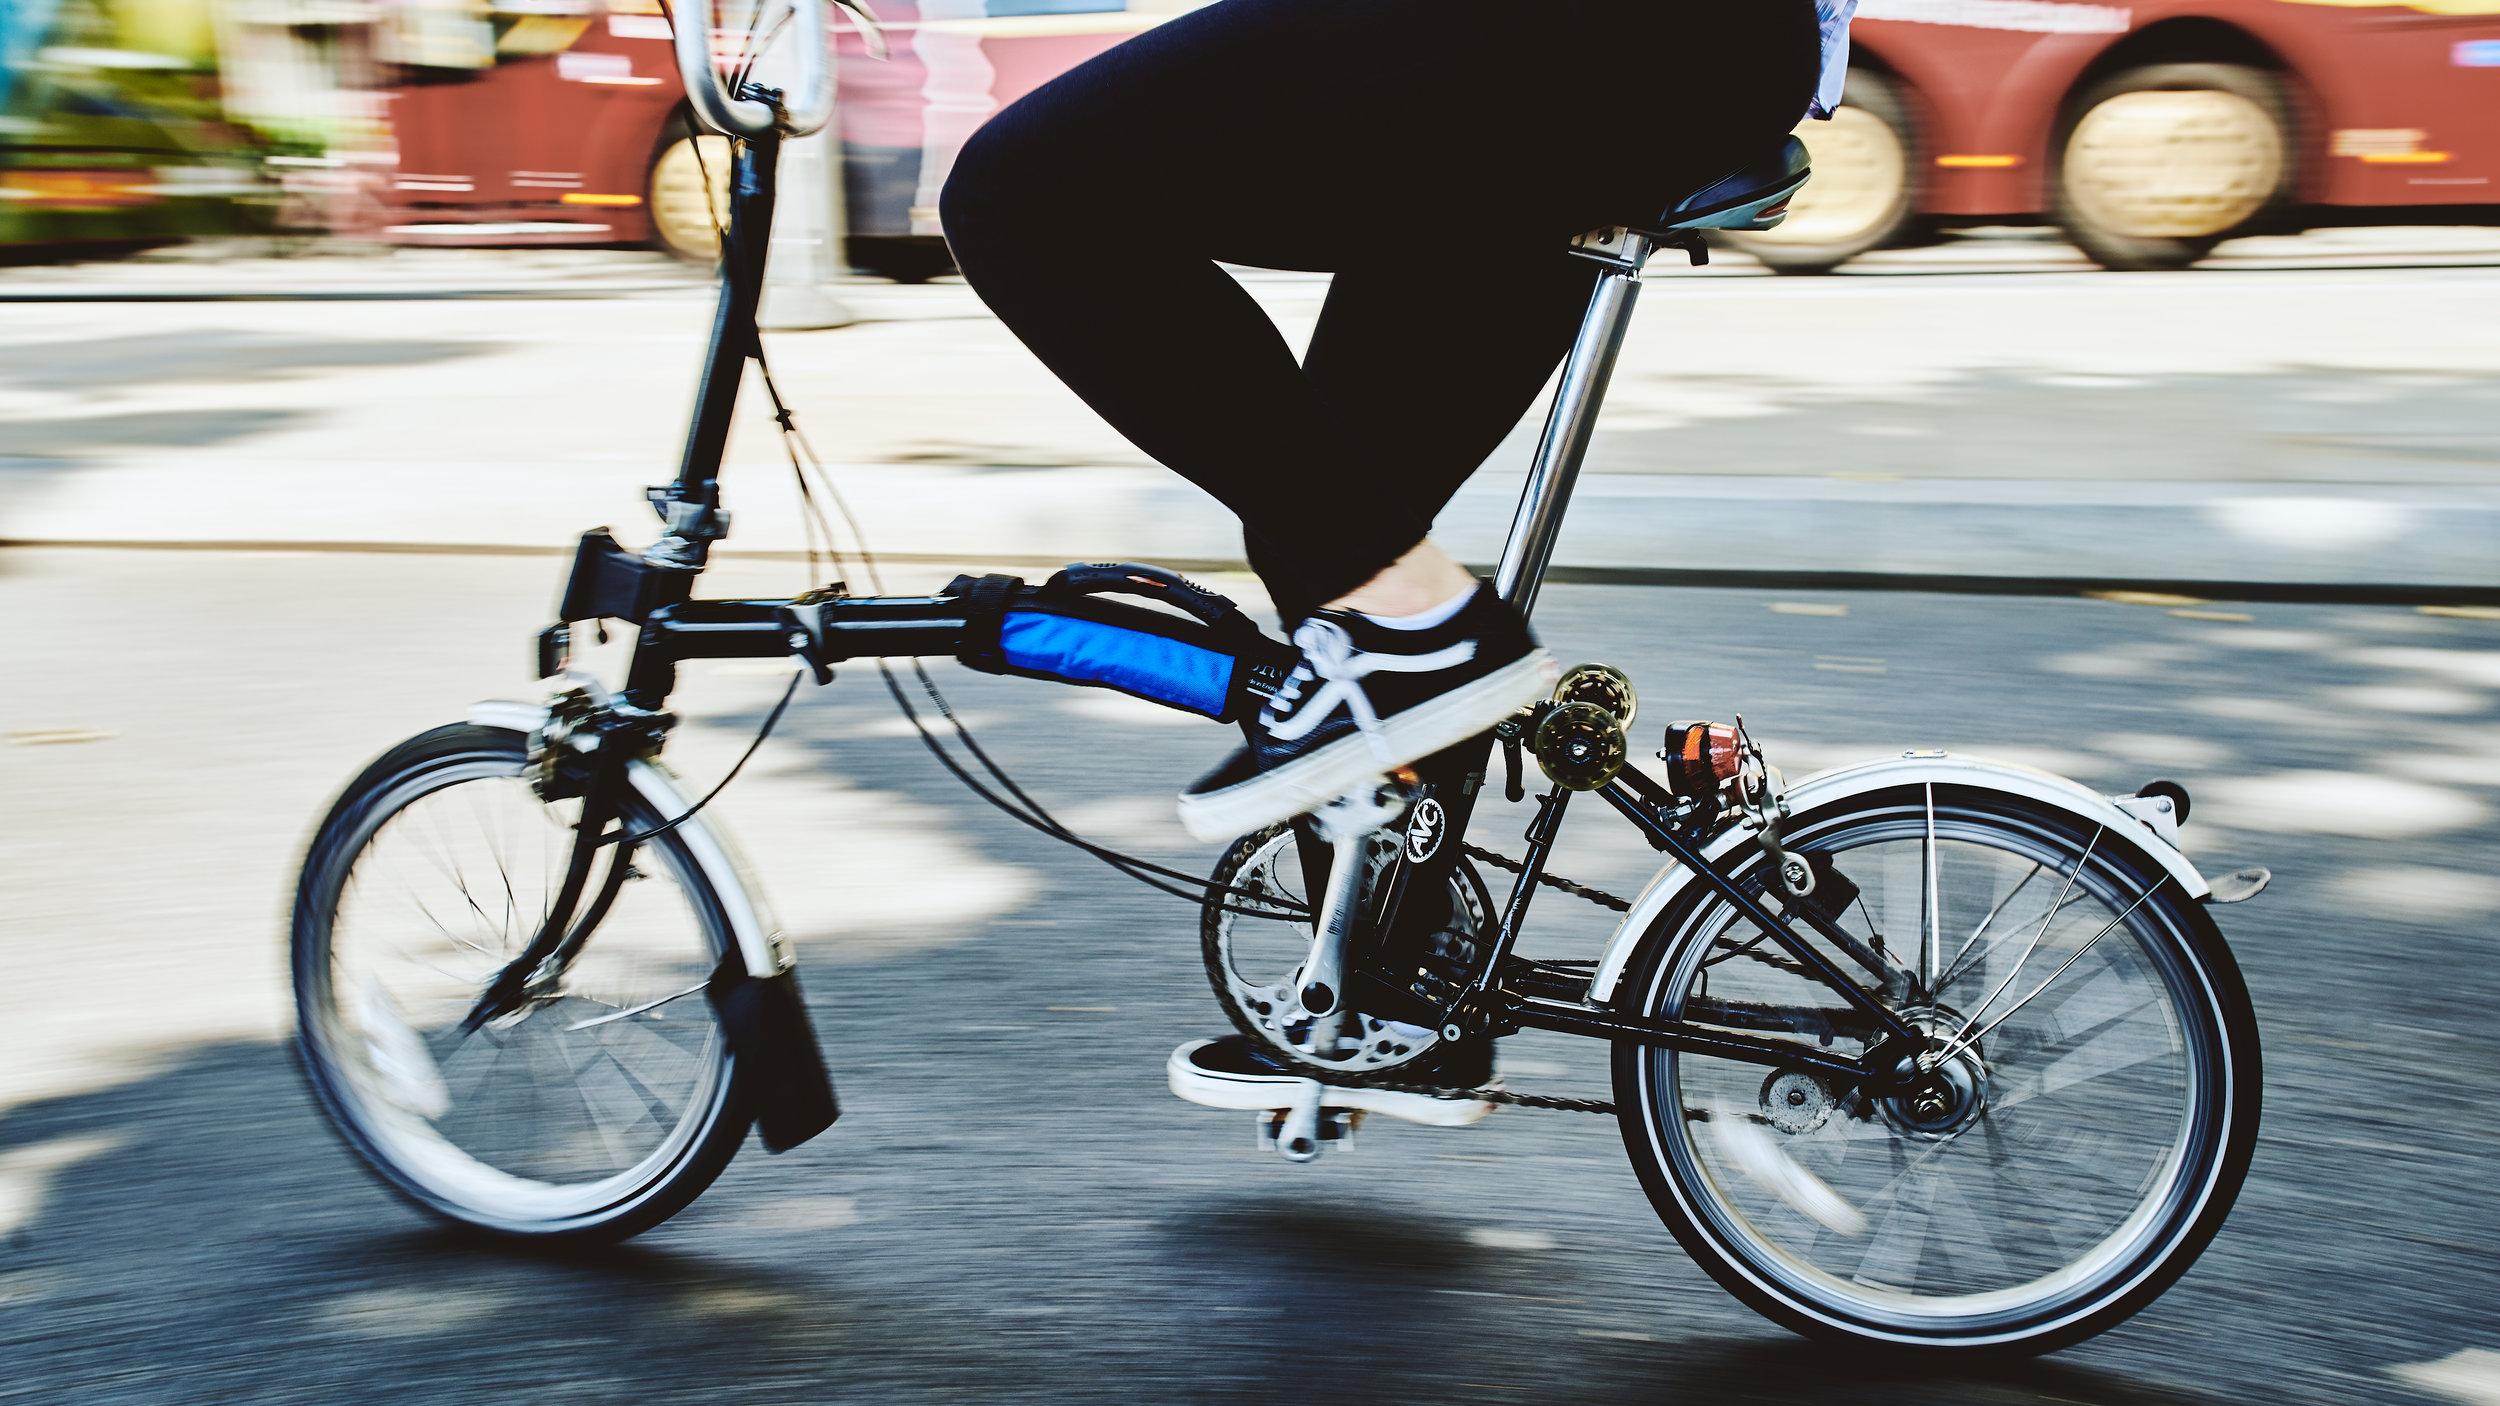 Off yer bike -